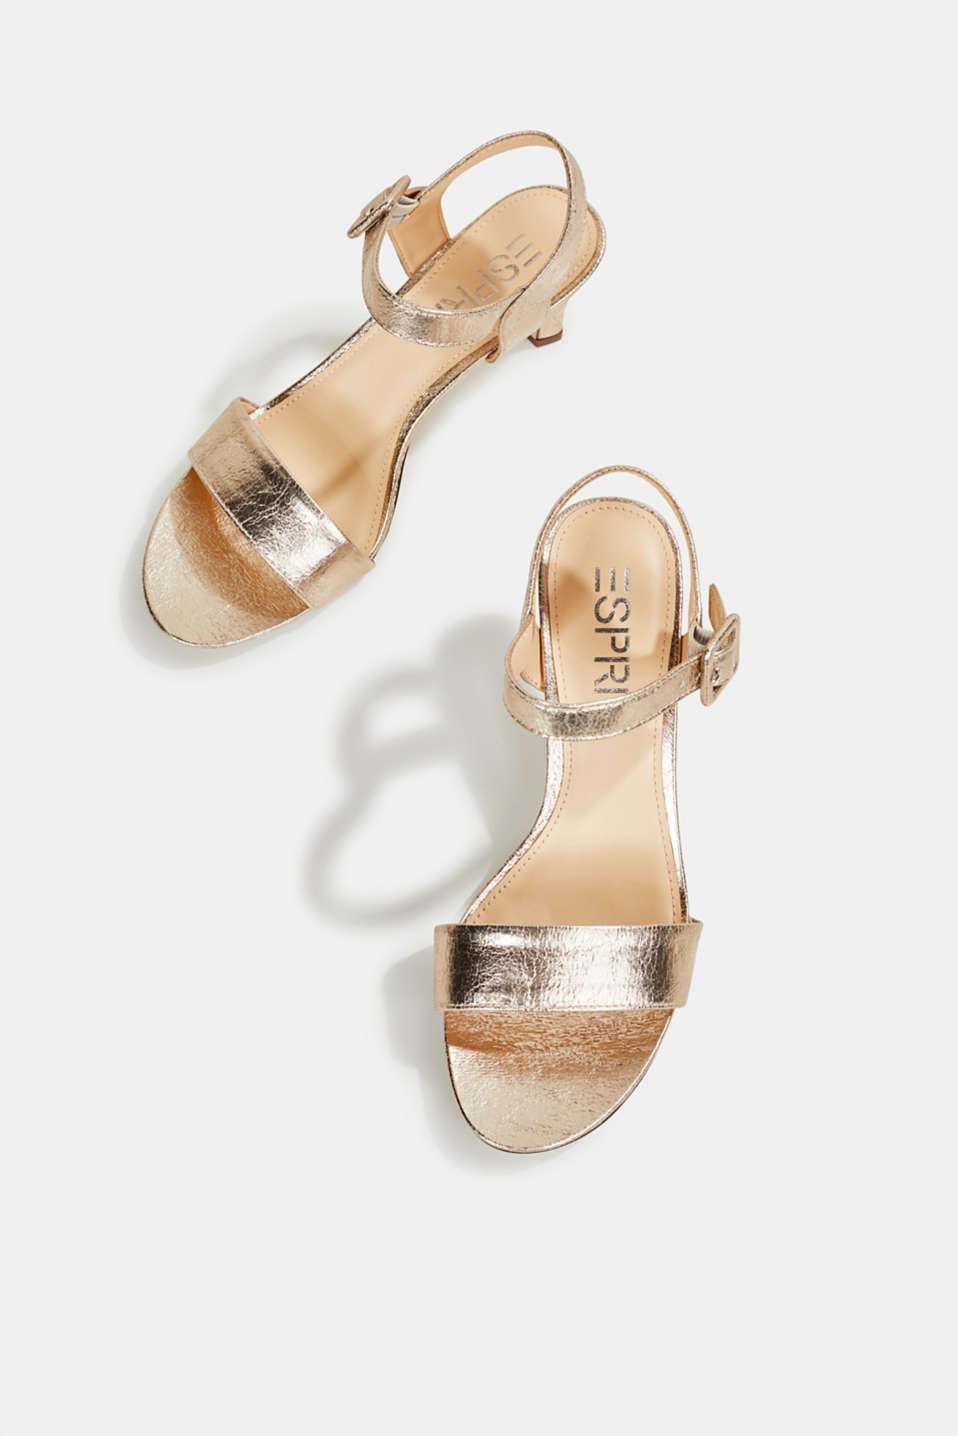 Sandals in a crushed metallic look, SKIN BEIGE, detail image number 1